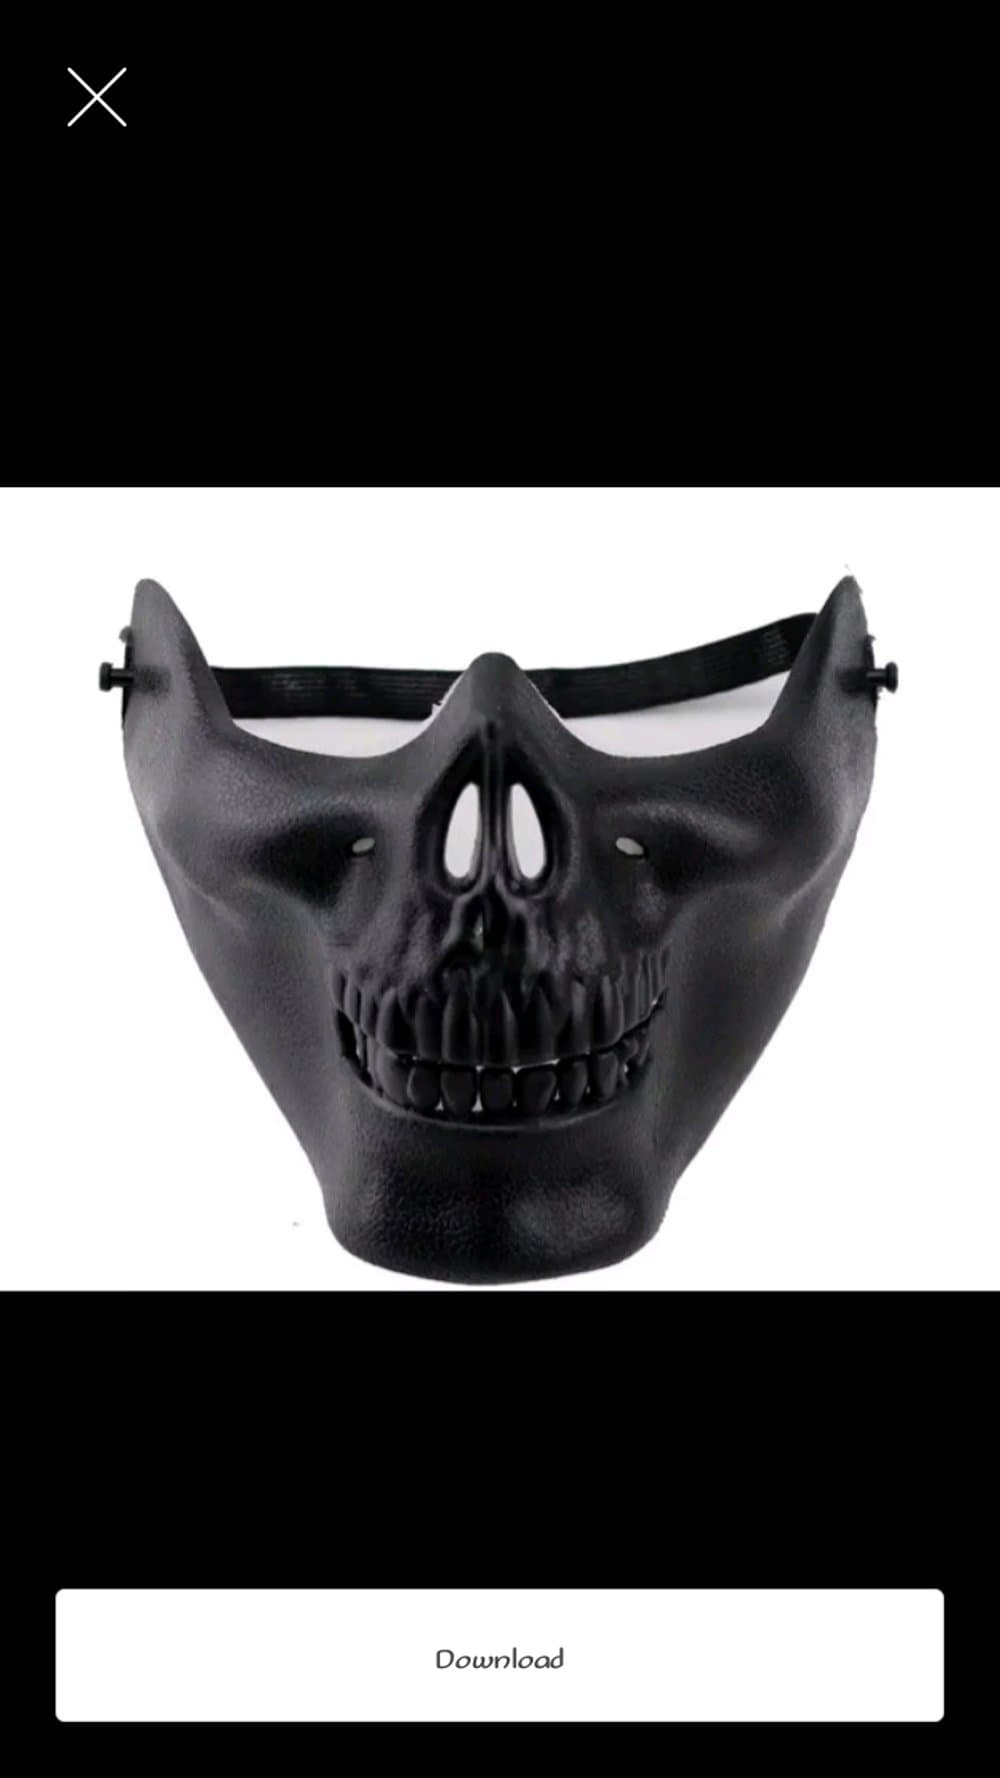 BELI topeng setengah muka only black dan silver Diskon 0055c8c1fa